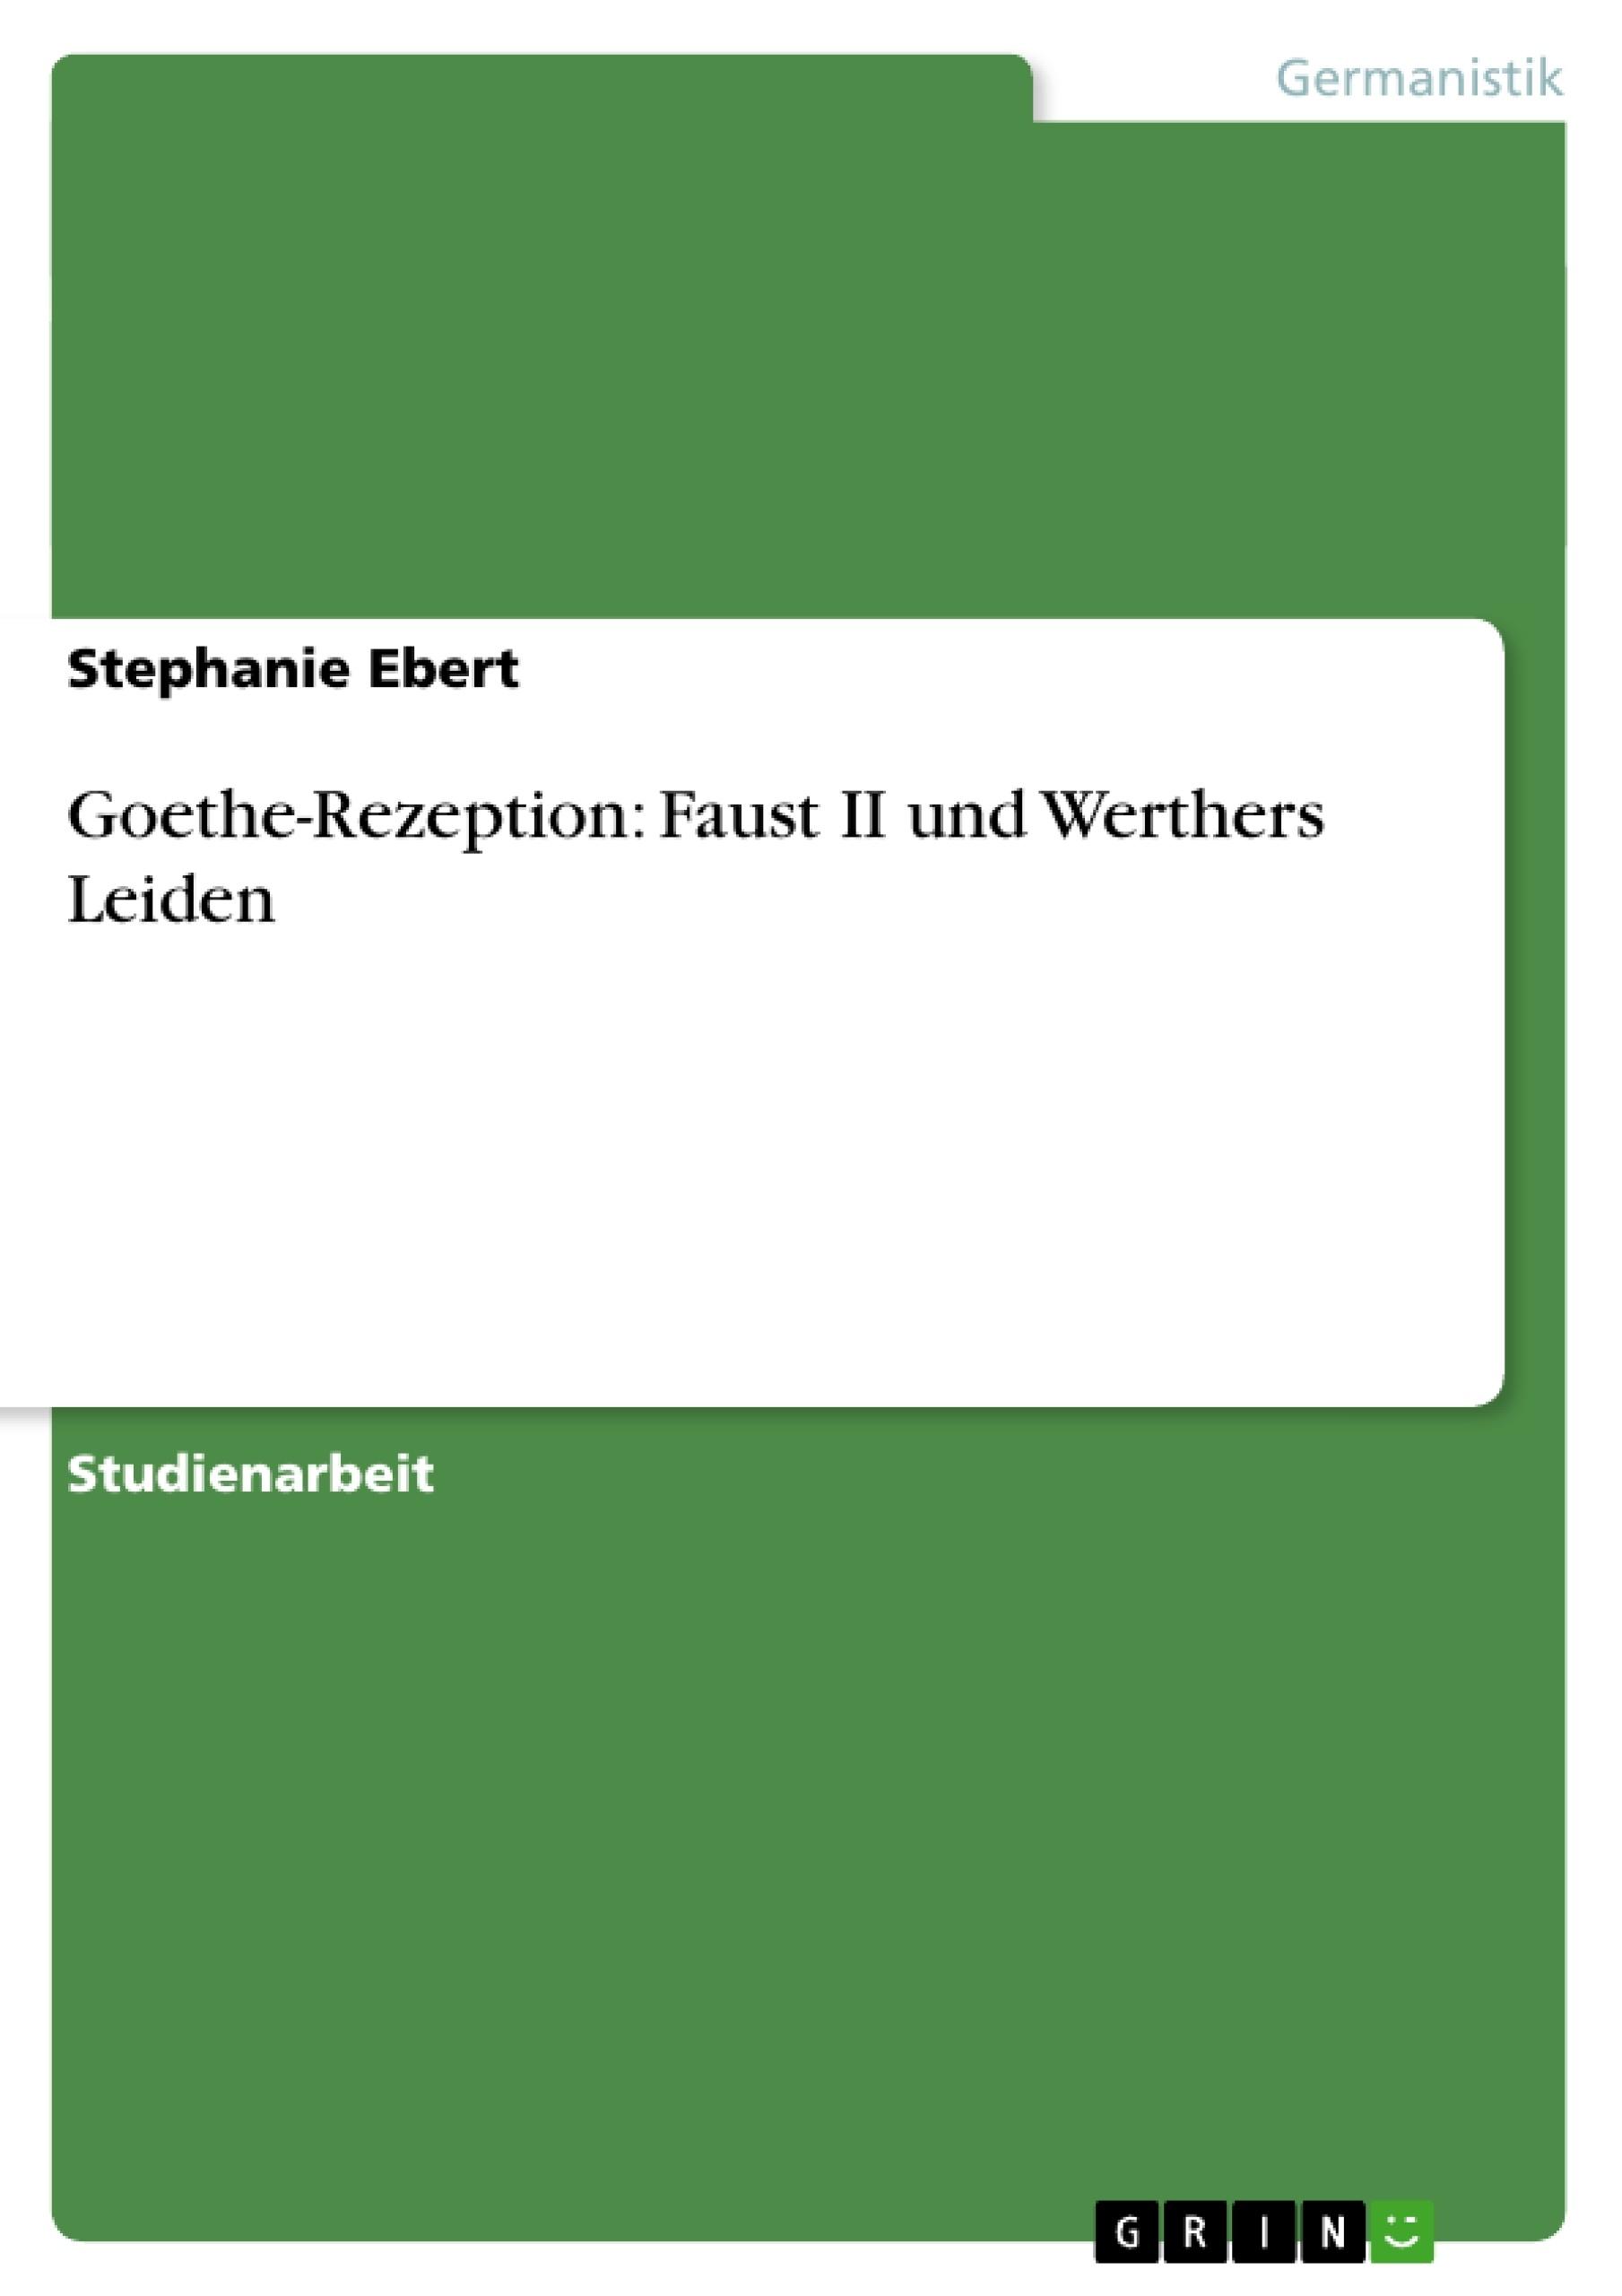 Titel: Goethe-Rezeption: Faust II und Werthers Leiden